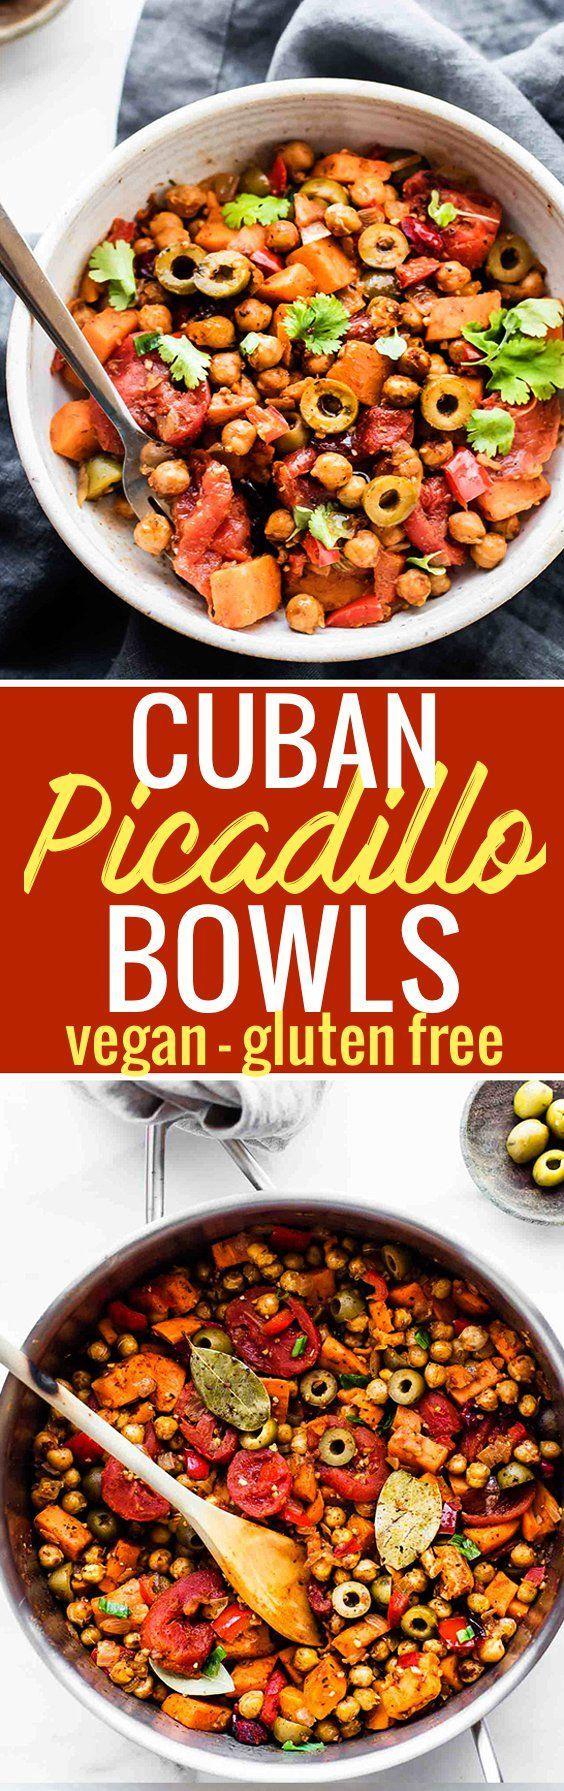 how to make cuban picadillo